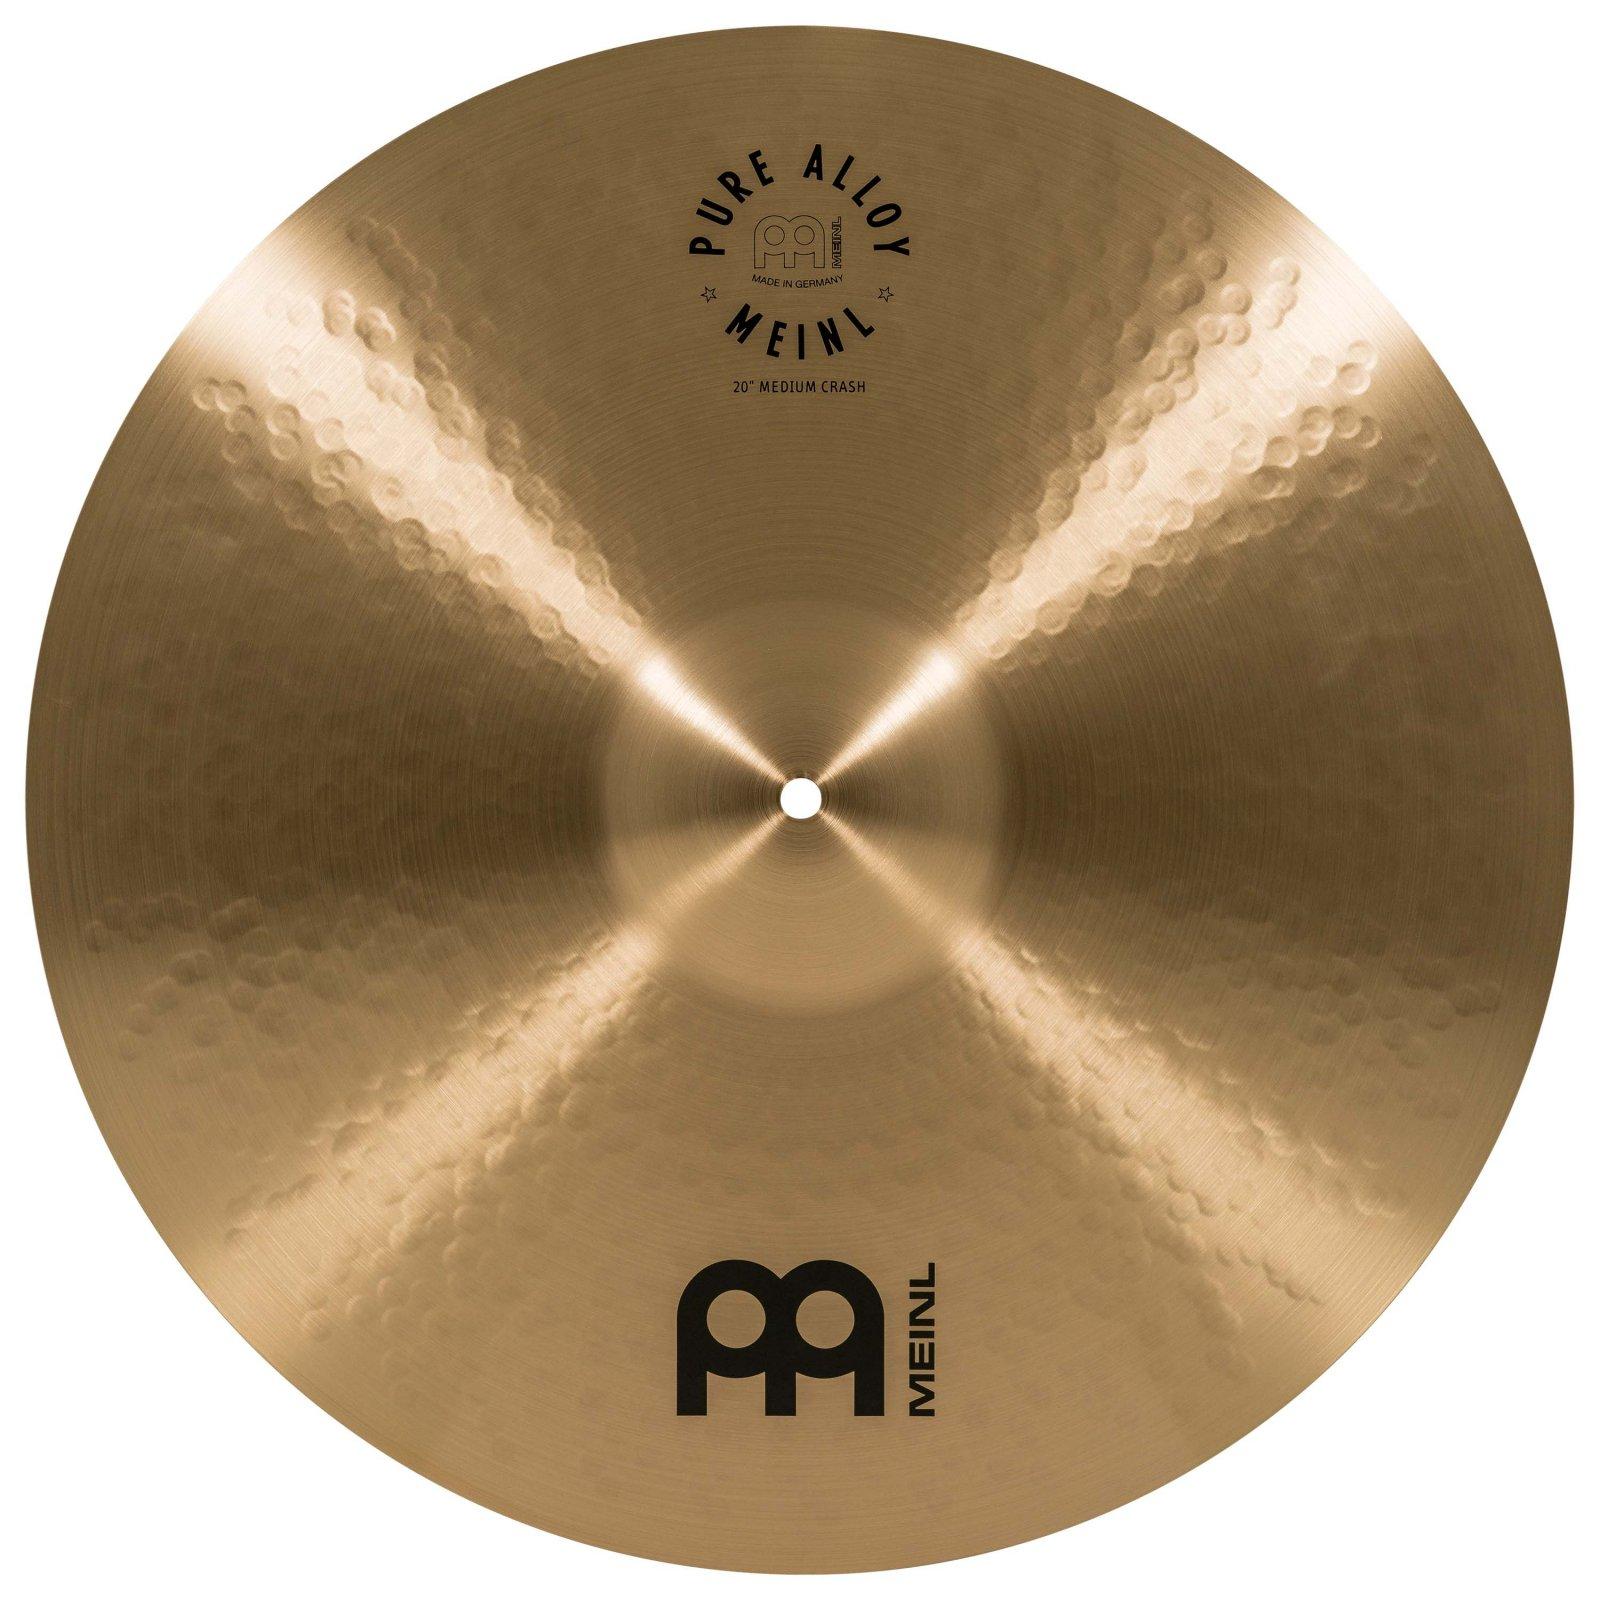 Meinl 20 Pure Alloy Traditional Medium Crash